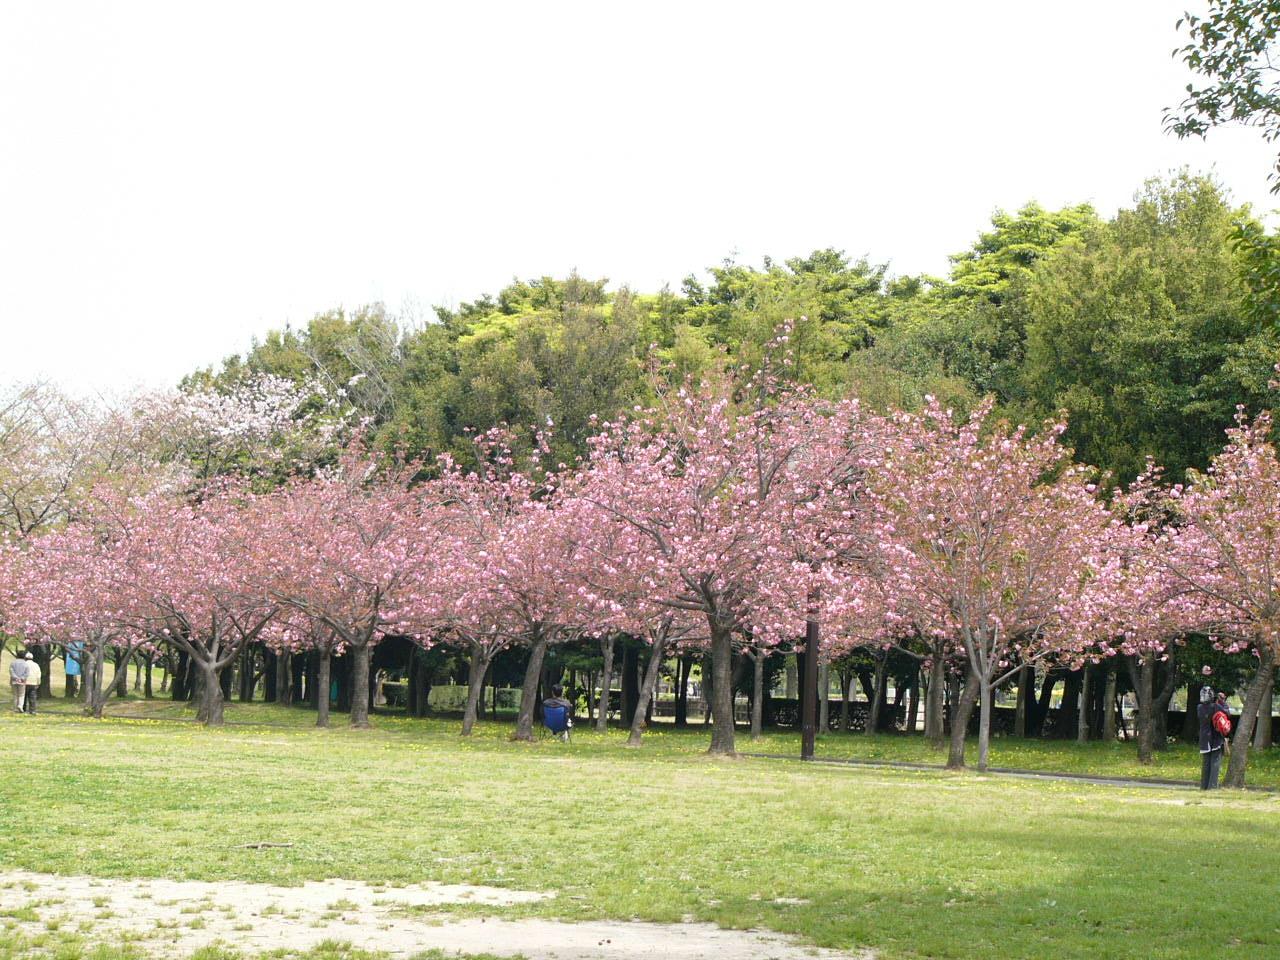 Bunga Sakura Rekah Indonesia Taman Cibodas Kebun Raya Merayakan Rekahnya